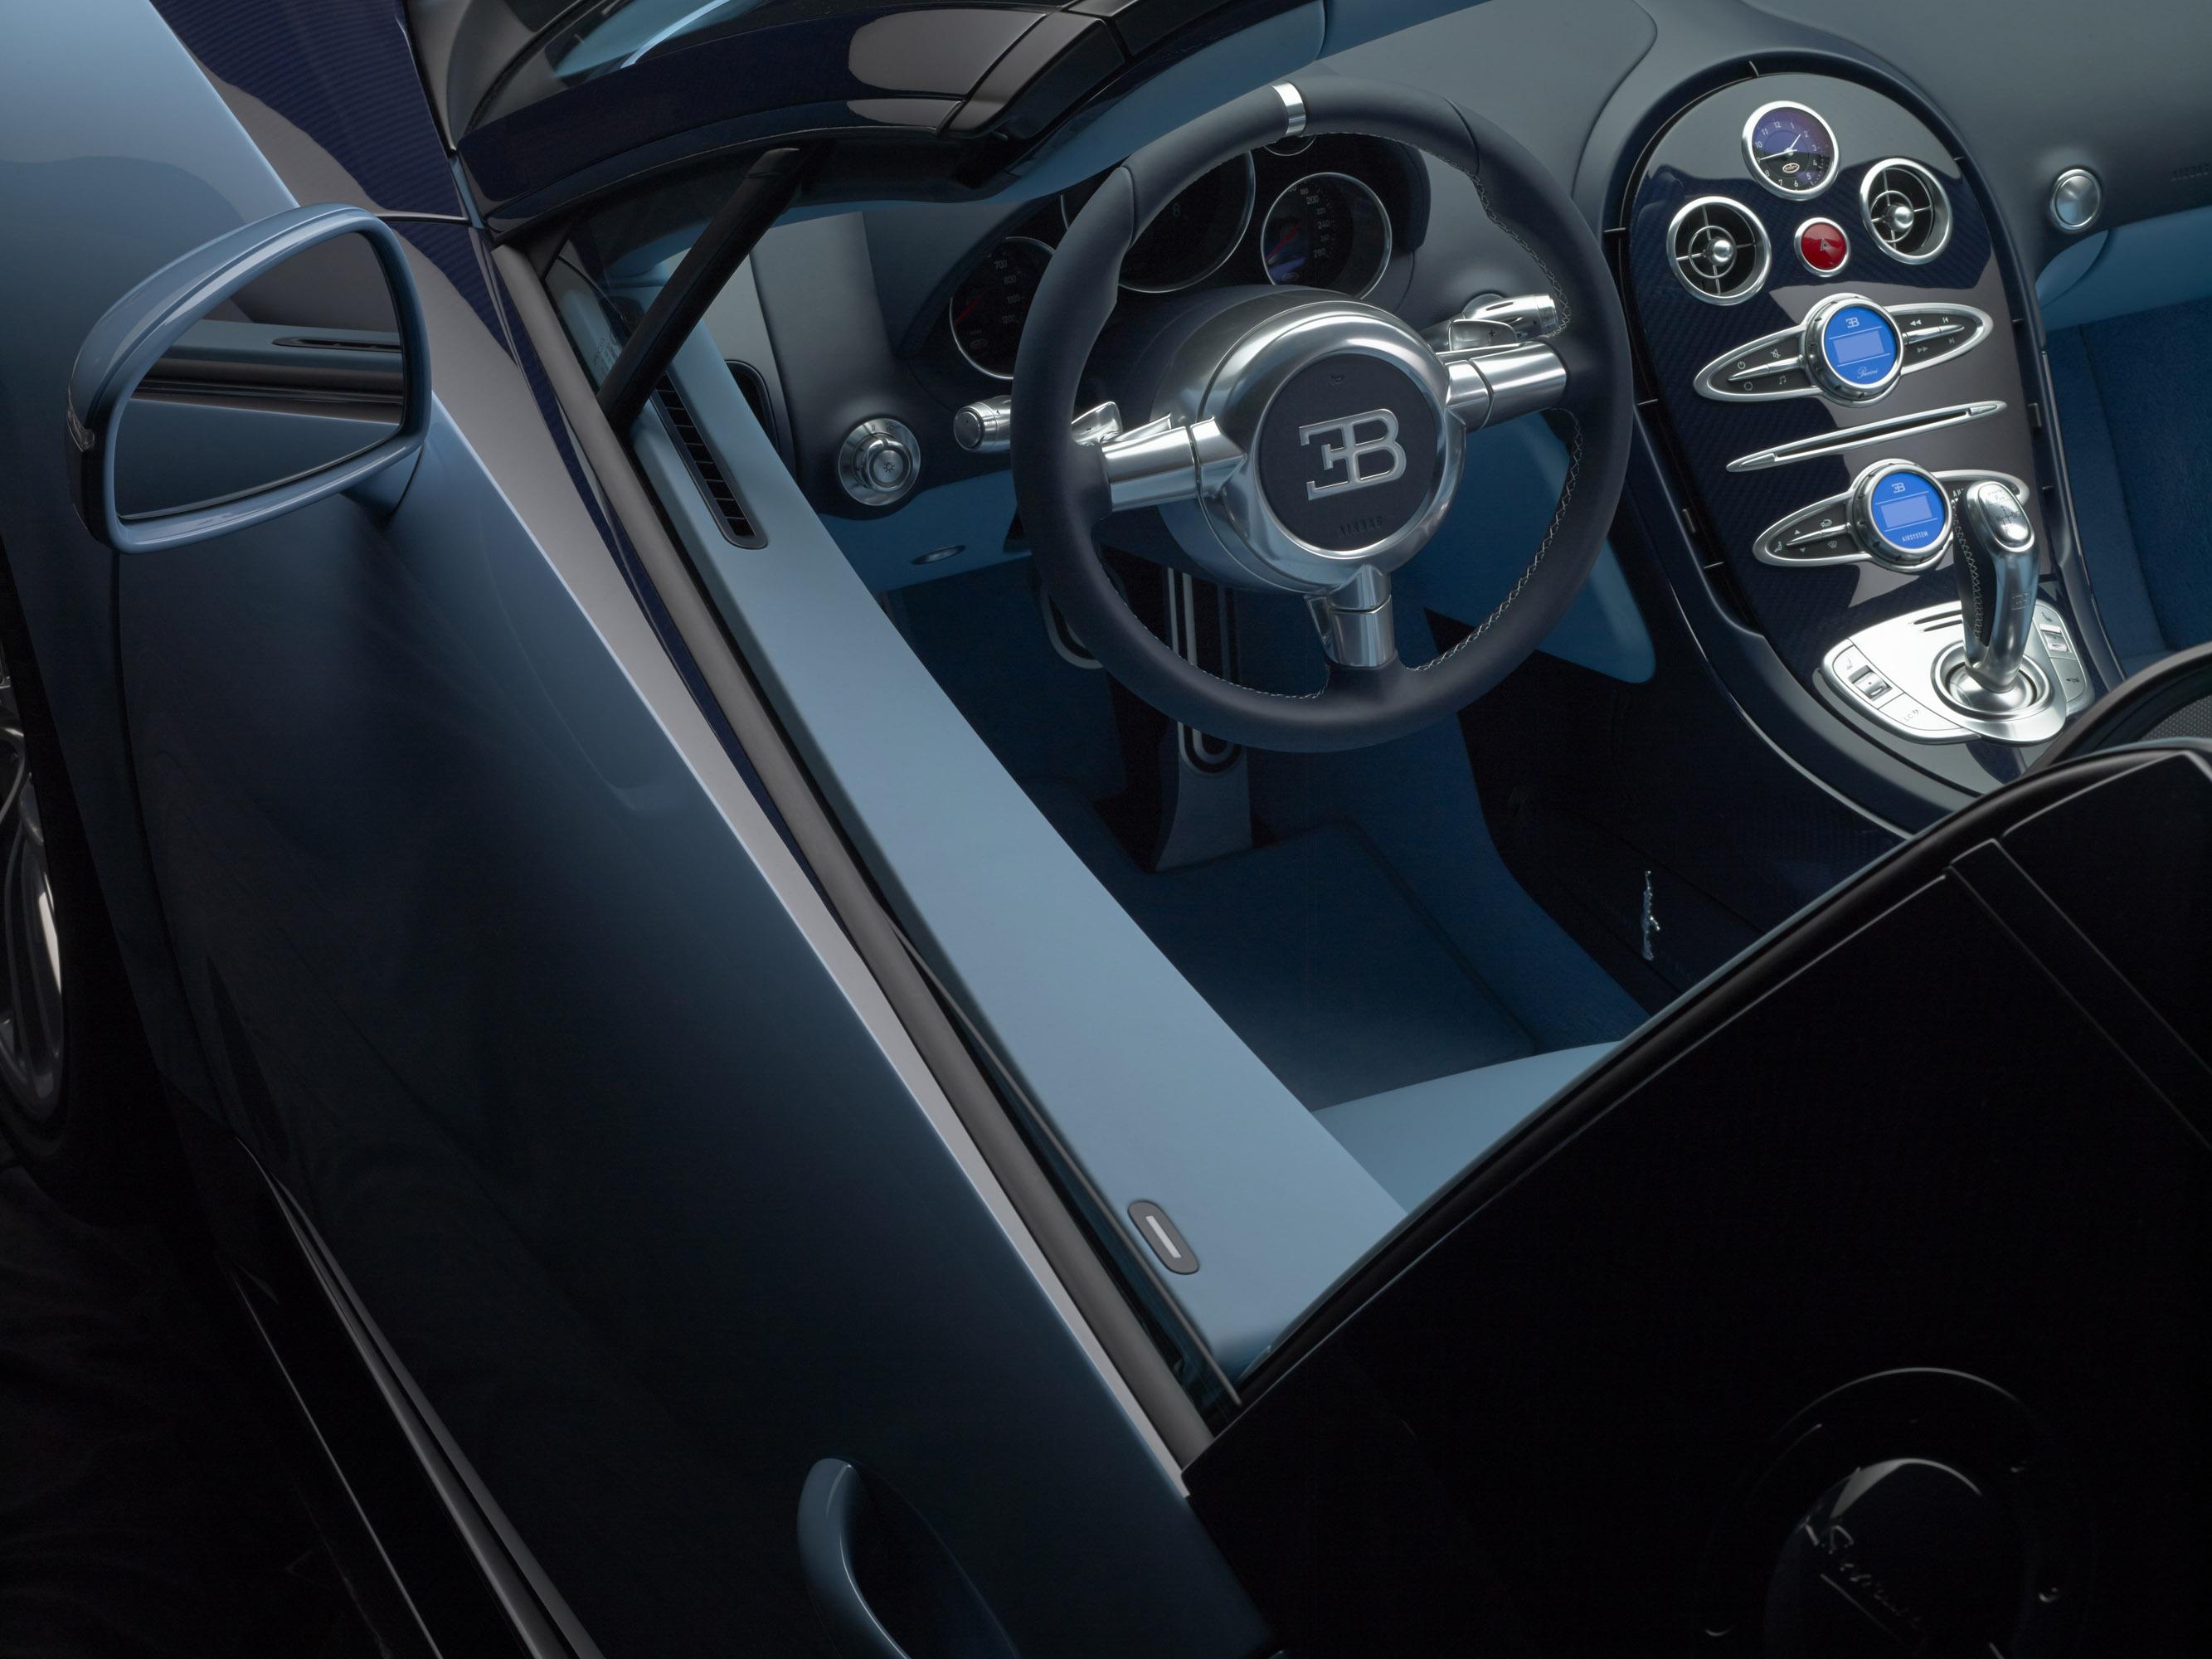 bugatti-veyron-grand-sport-vitesse-jean-pierre-wimille-edition-12 Stunning Bugatti Veyron 16.4 Grand Sport Vitesse Interior Cars Trend